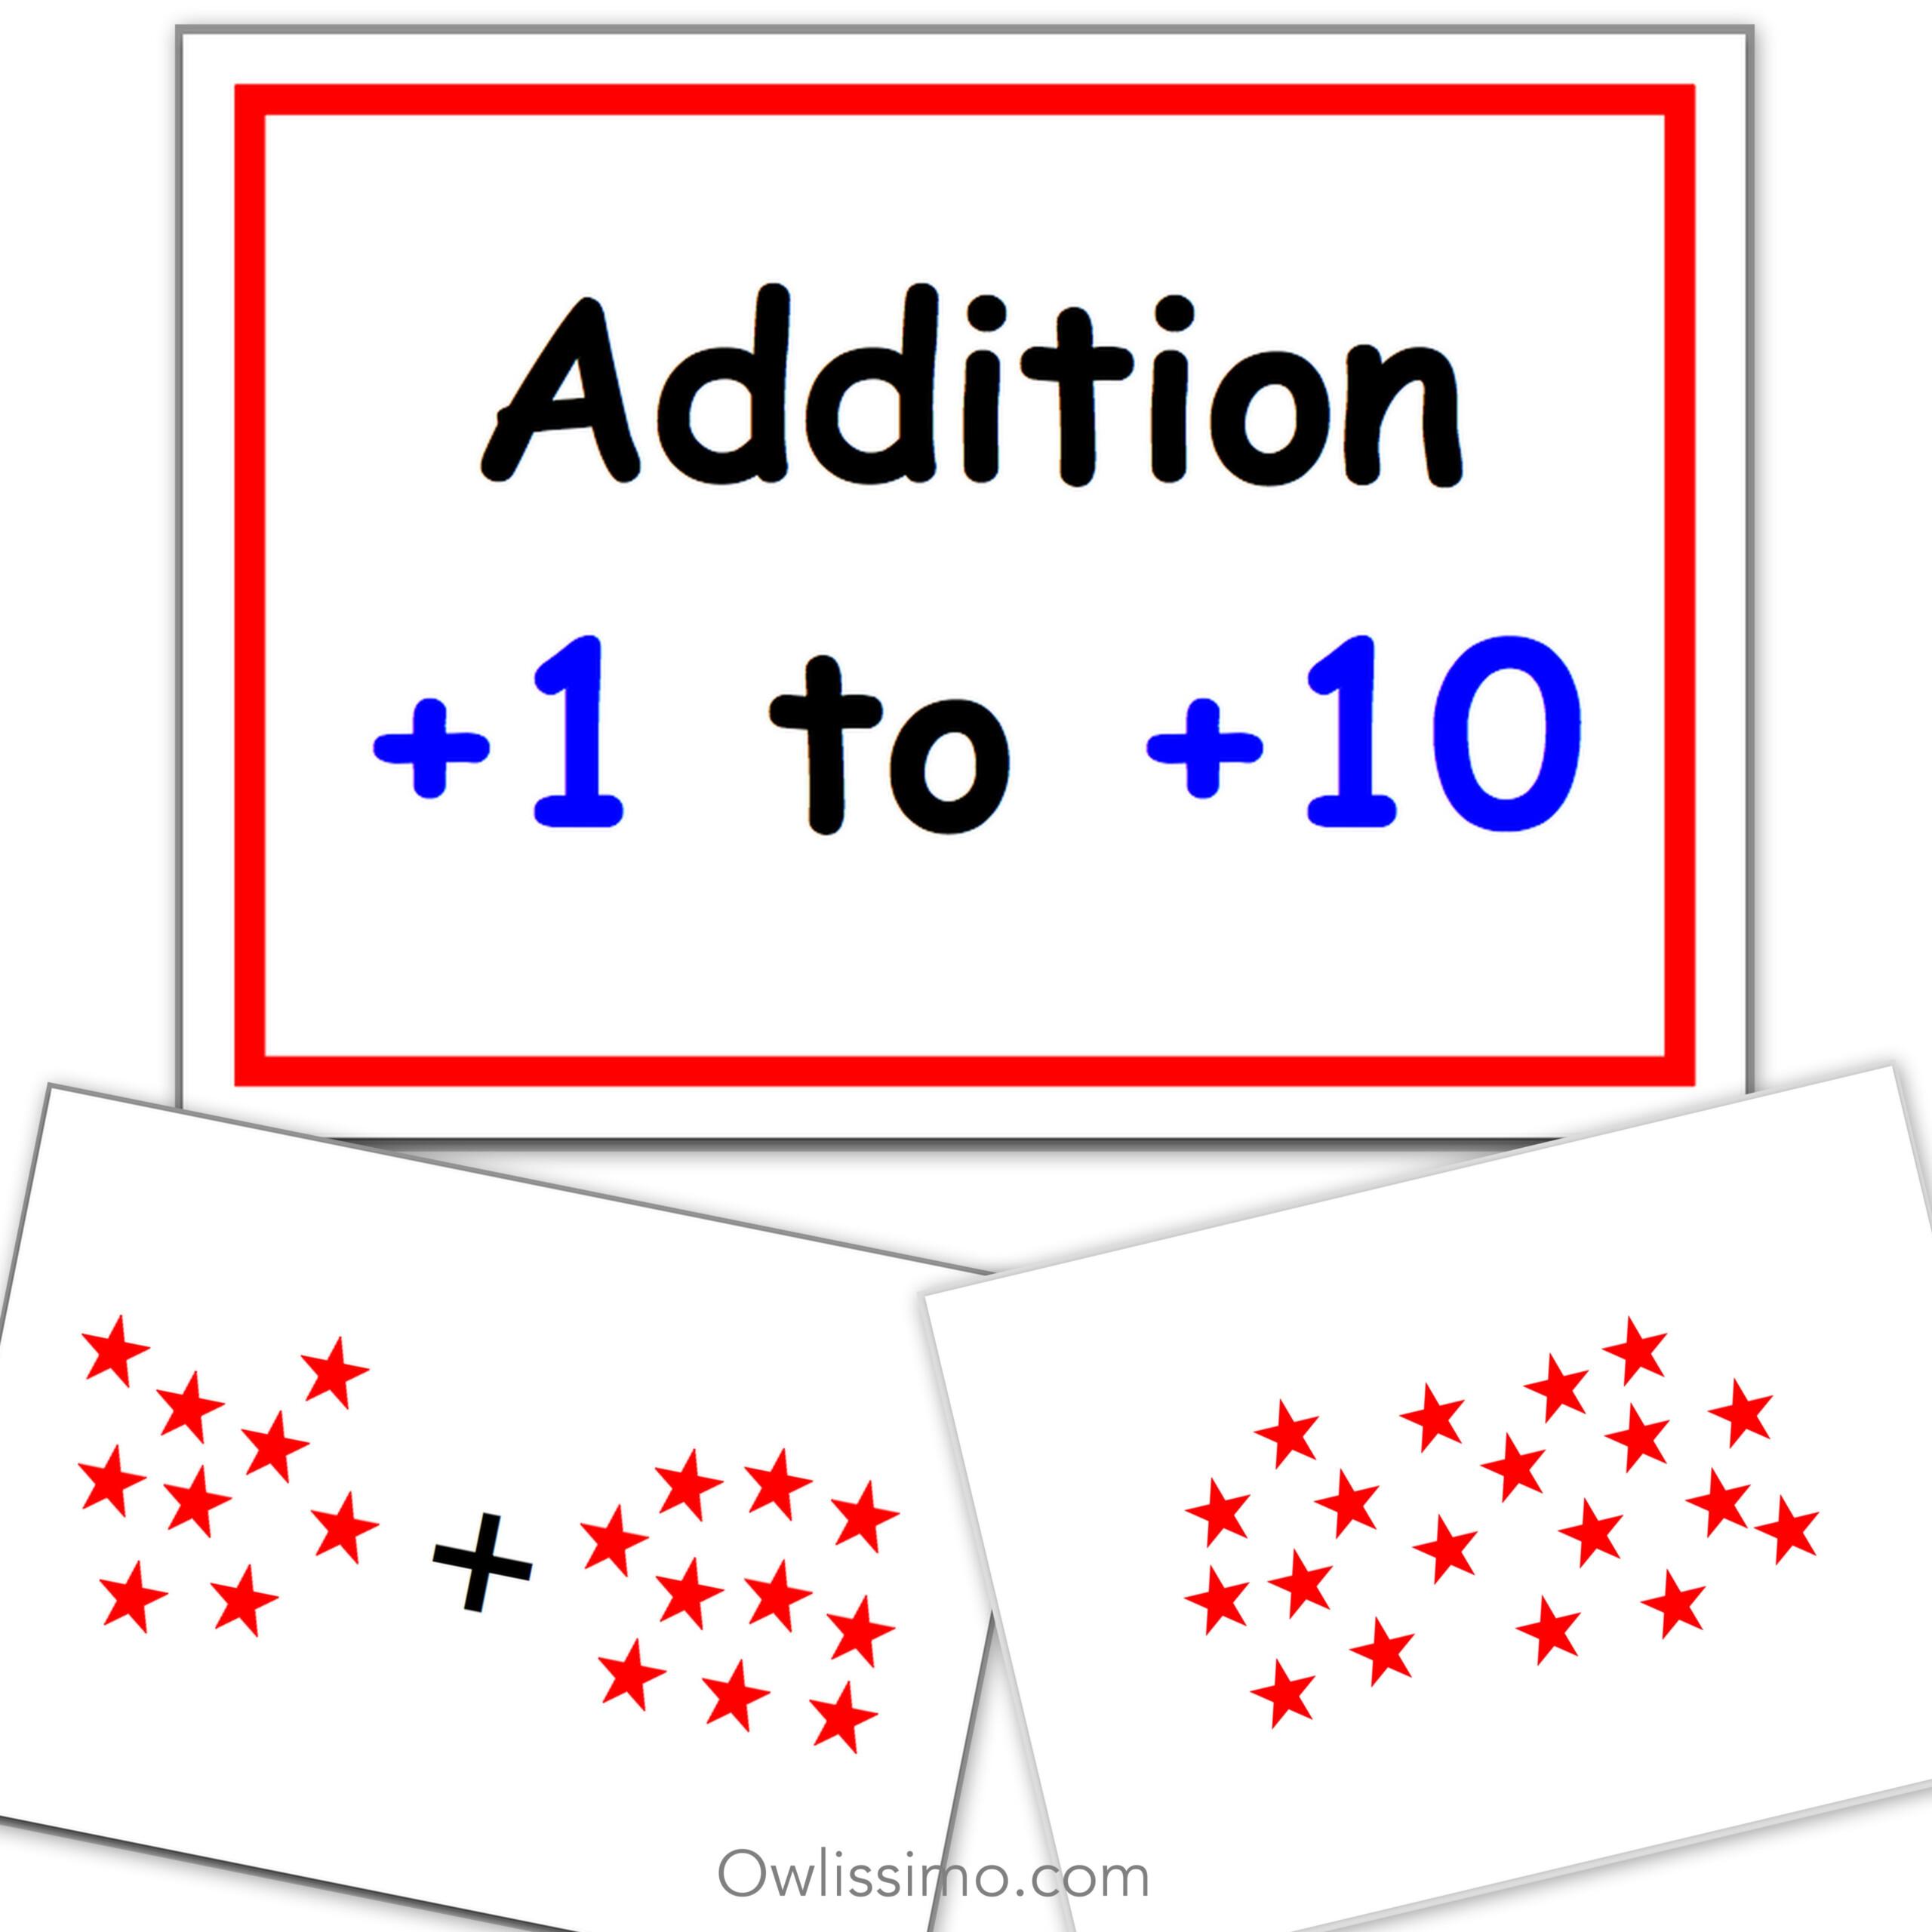 Printable Flashcards - Addition